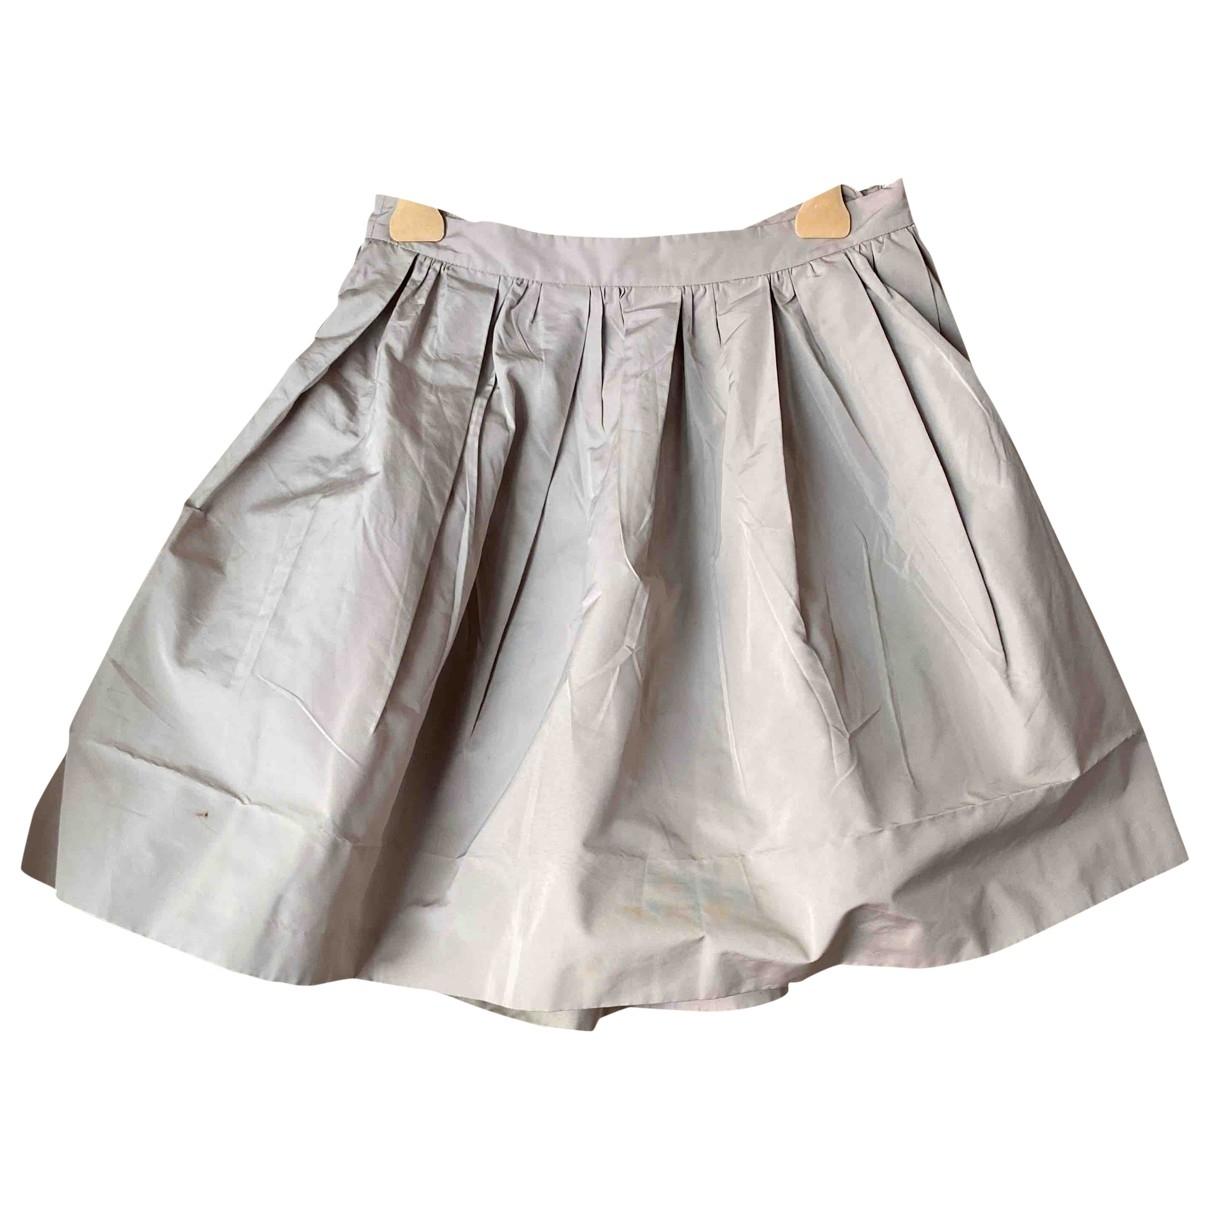 Miu Miu \N Beige skirt for Women 42 IT